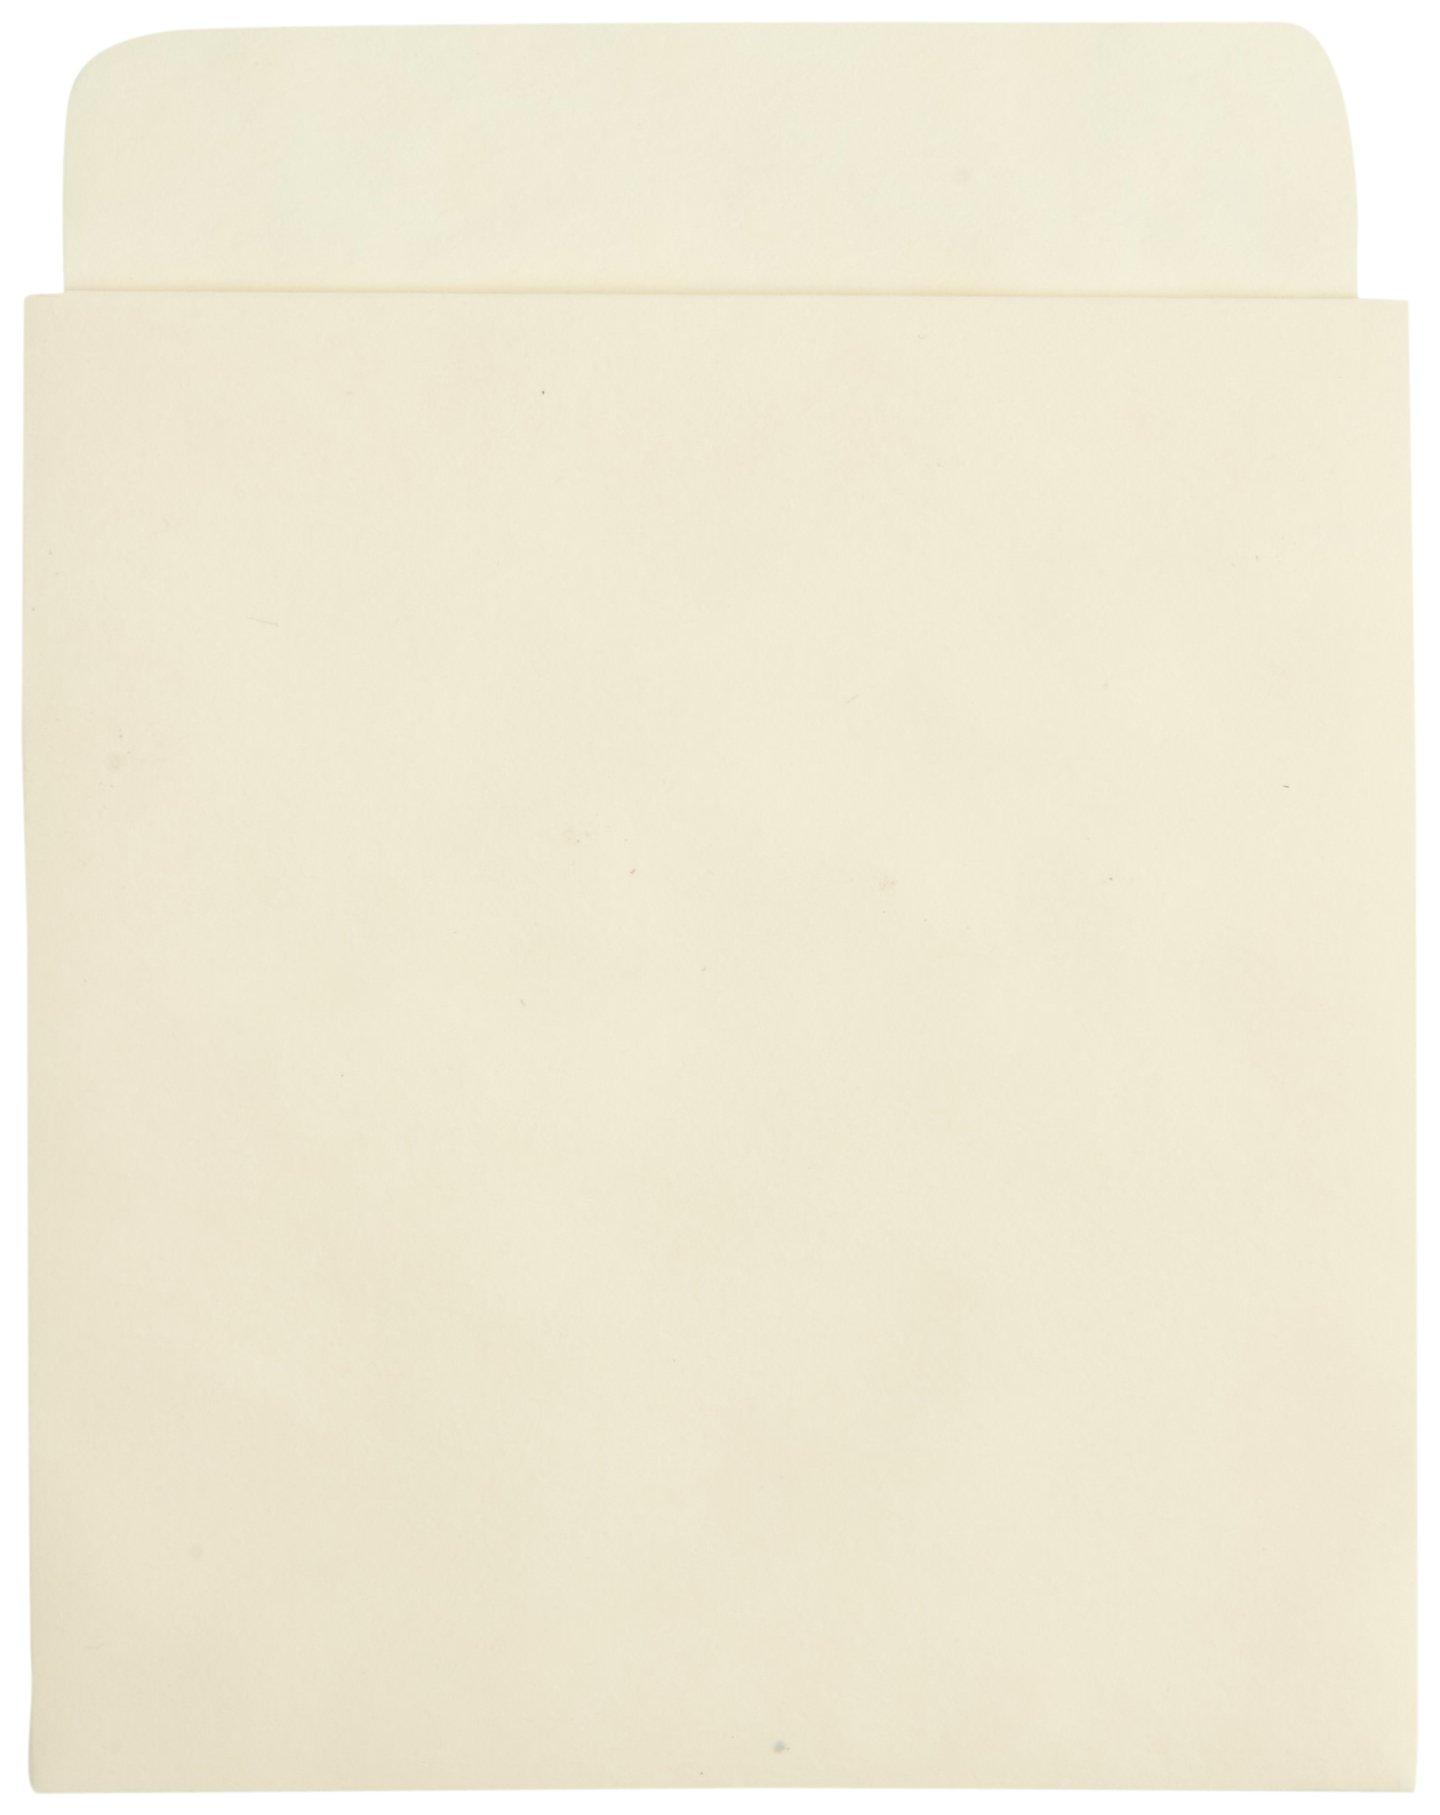 Kapco Standard Back Self-Stick Book Pocket, 3-1/2 x 4-1/2 Inches, Manila, Pack of 500 - S/PSB